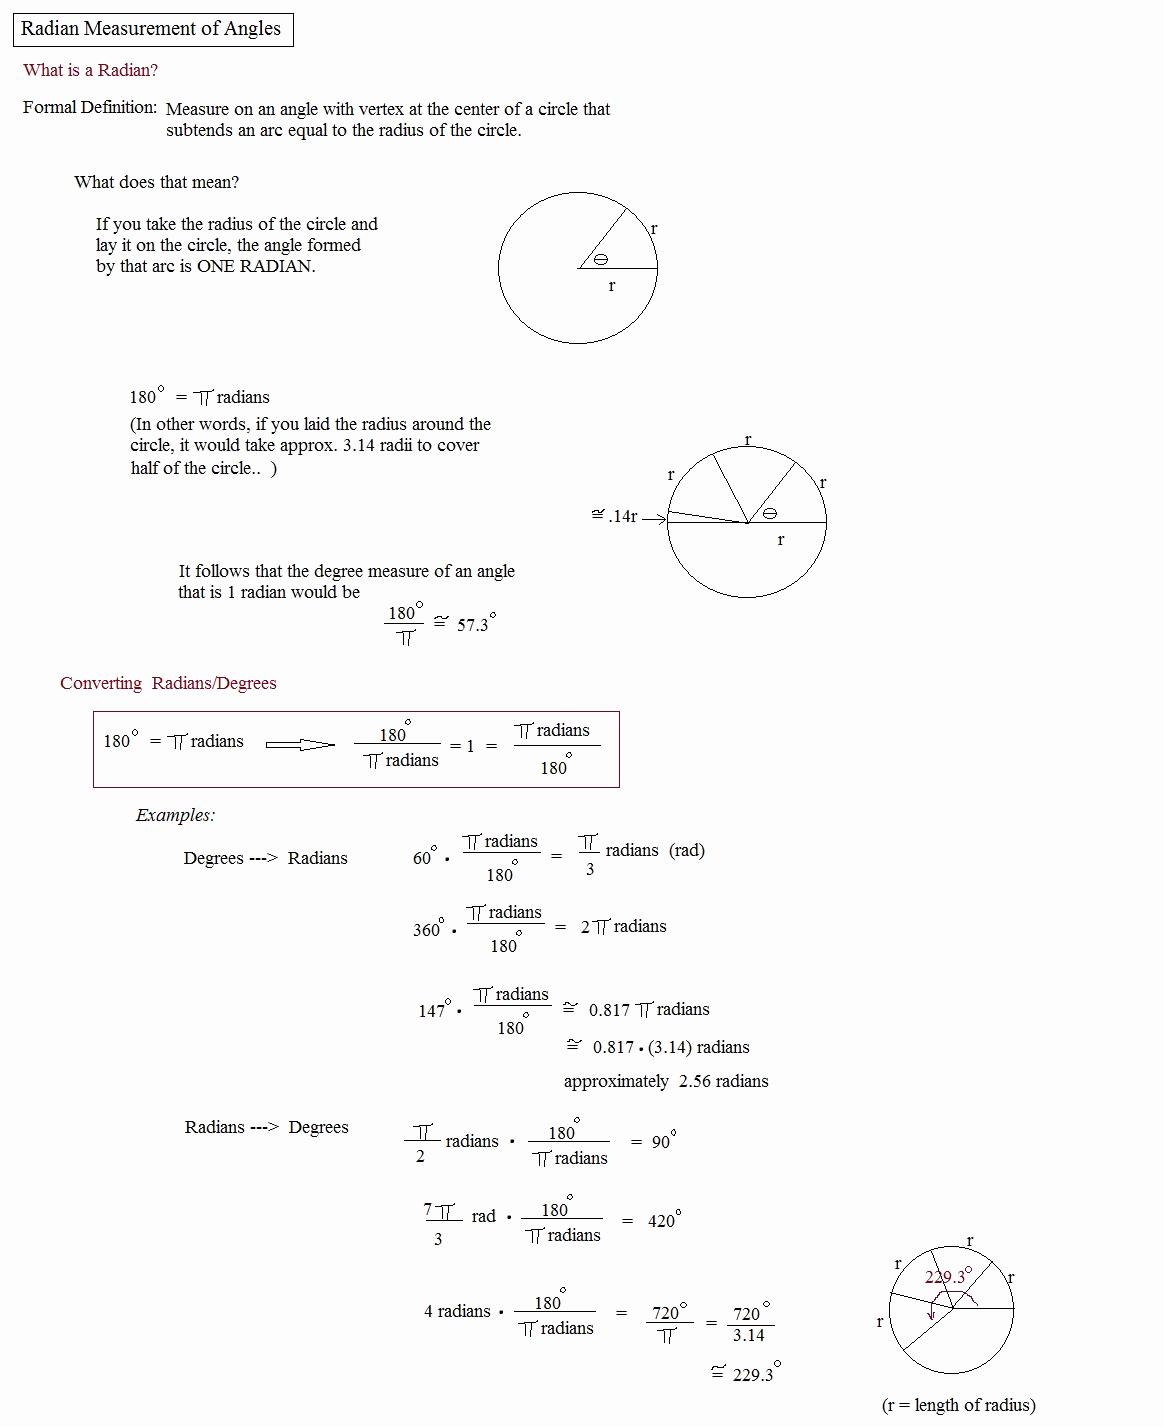 Radians to Degrees Worksheet Luxury Math Plane Angle Measurement